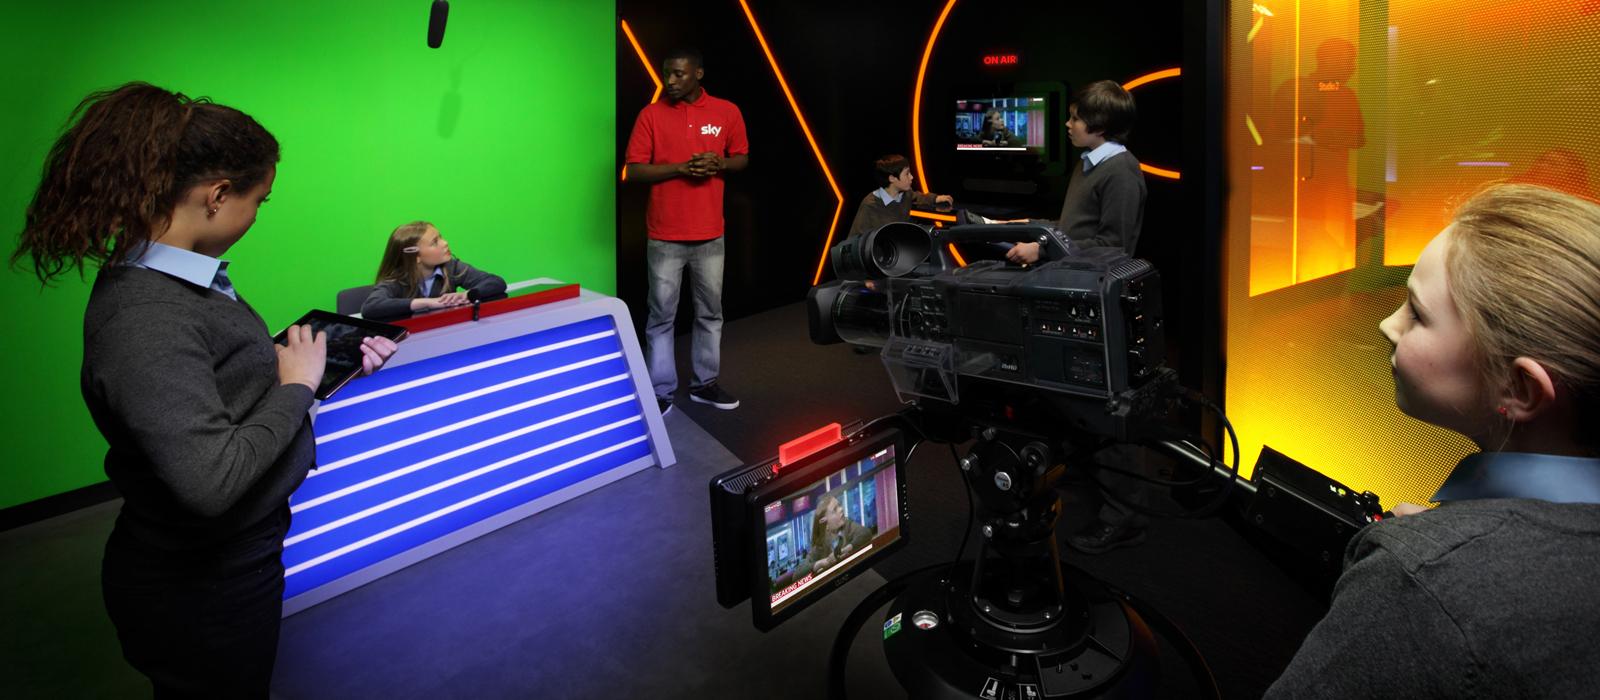 Sky Academy Studio